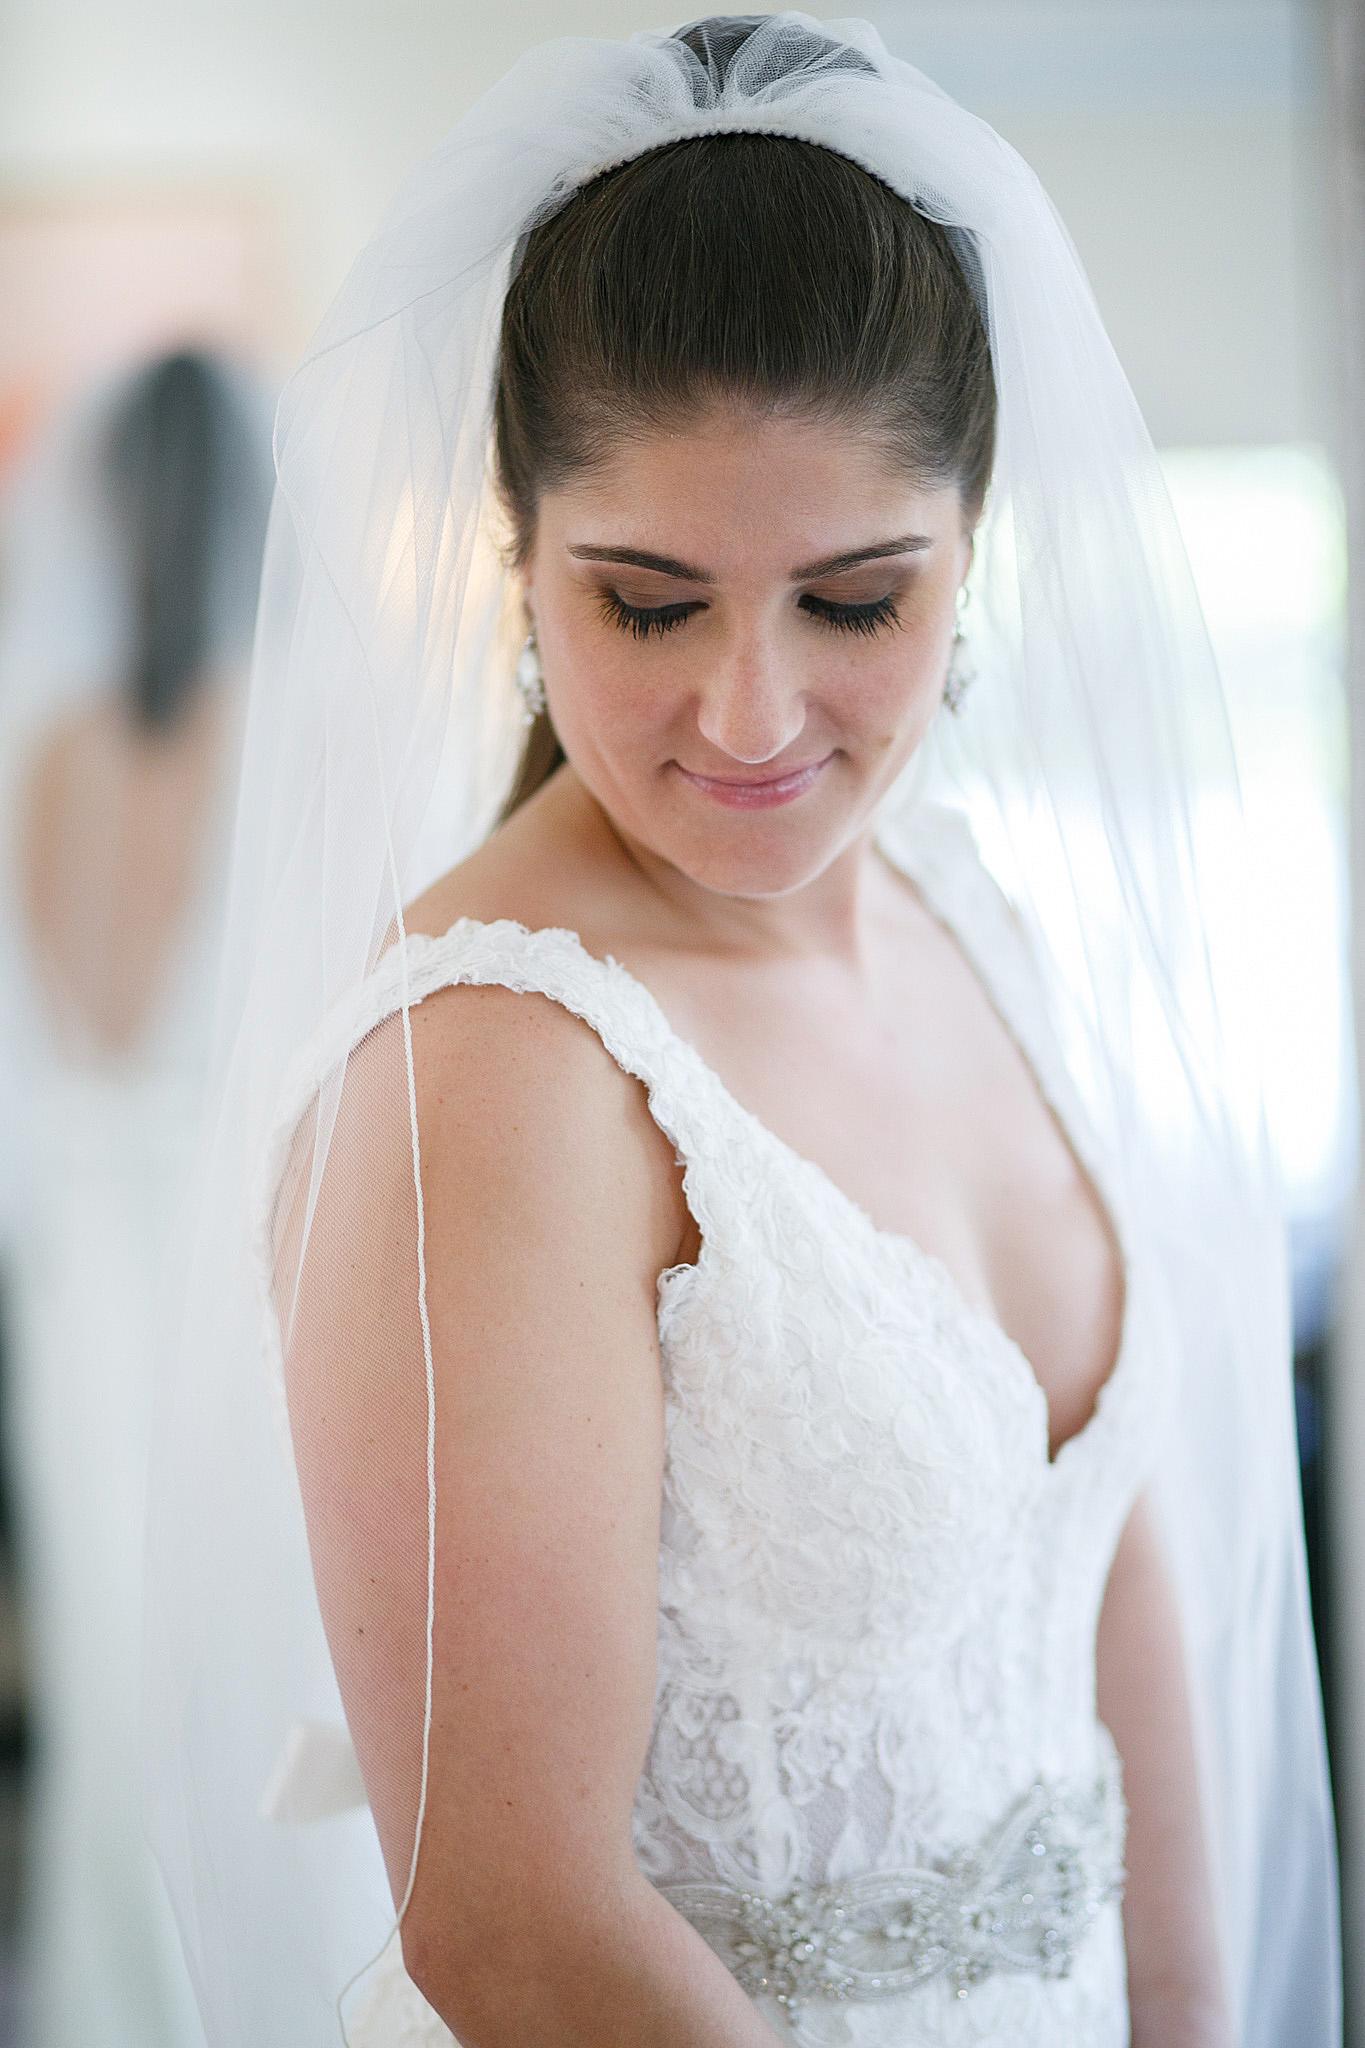 101516 MD Stephanie Williamson JM CoD - Peter Bang Photography - Katie Martin Wedding_0117.jpg